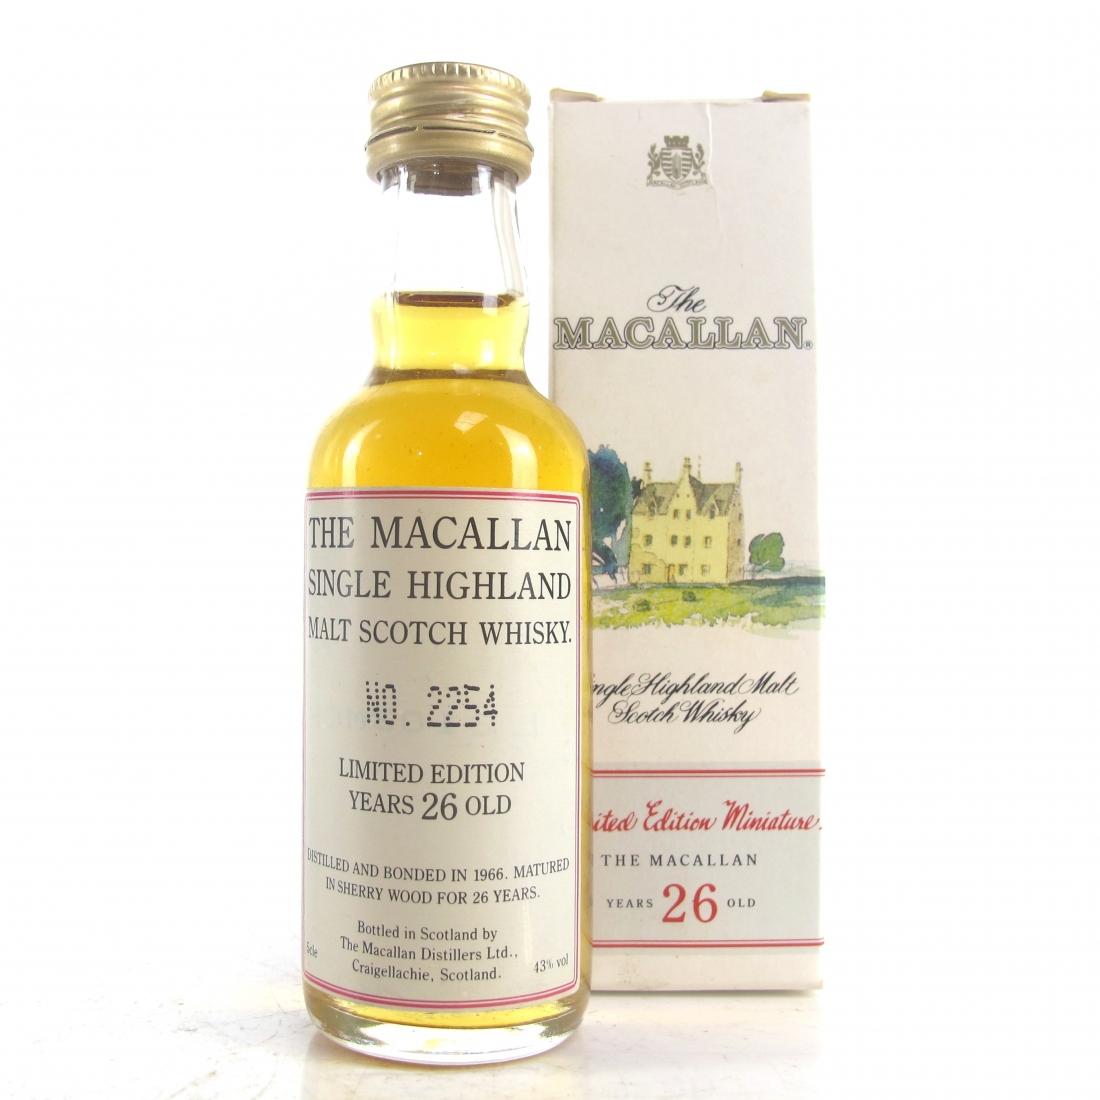 Macallan 1966 26 Year Old Miniature 5cl